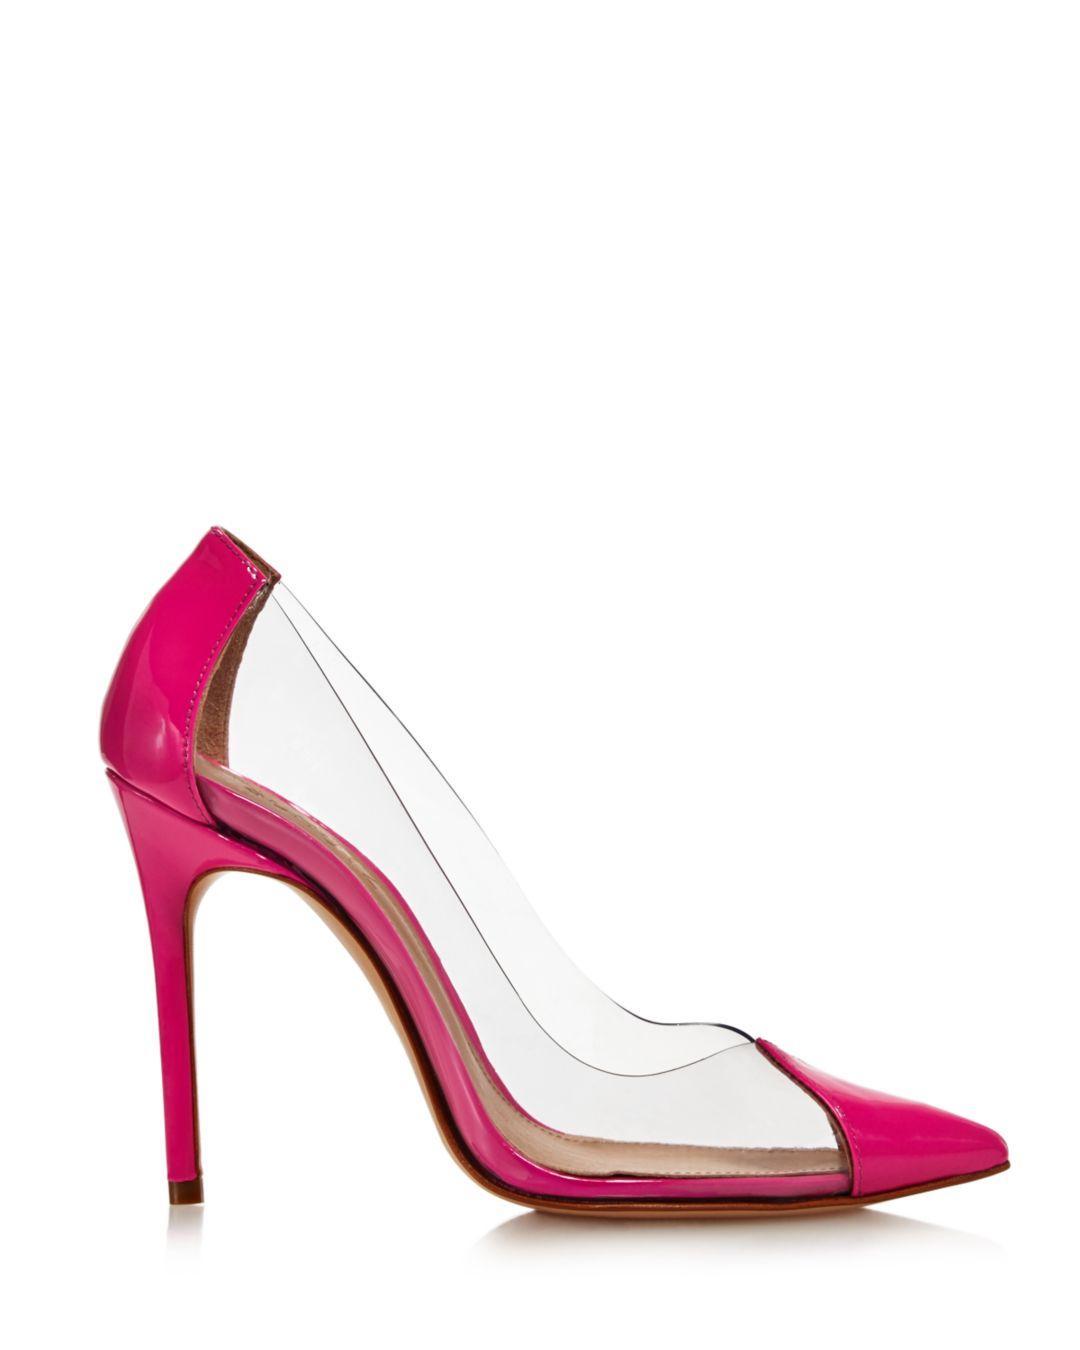 76fce43a64004 Lyst - Schutz Women s Cendi Patent Leather High-heel Pumps